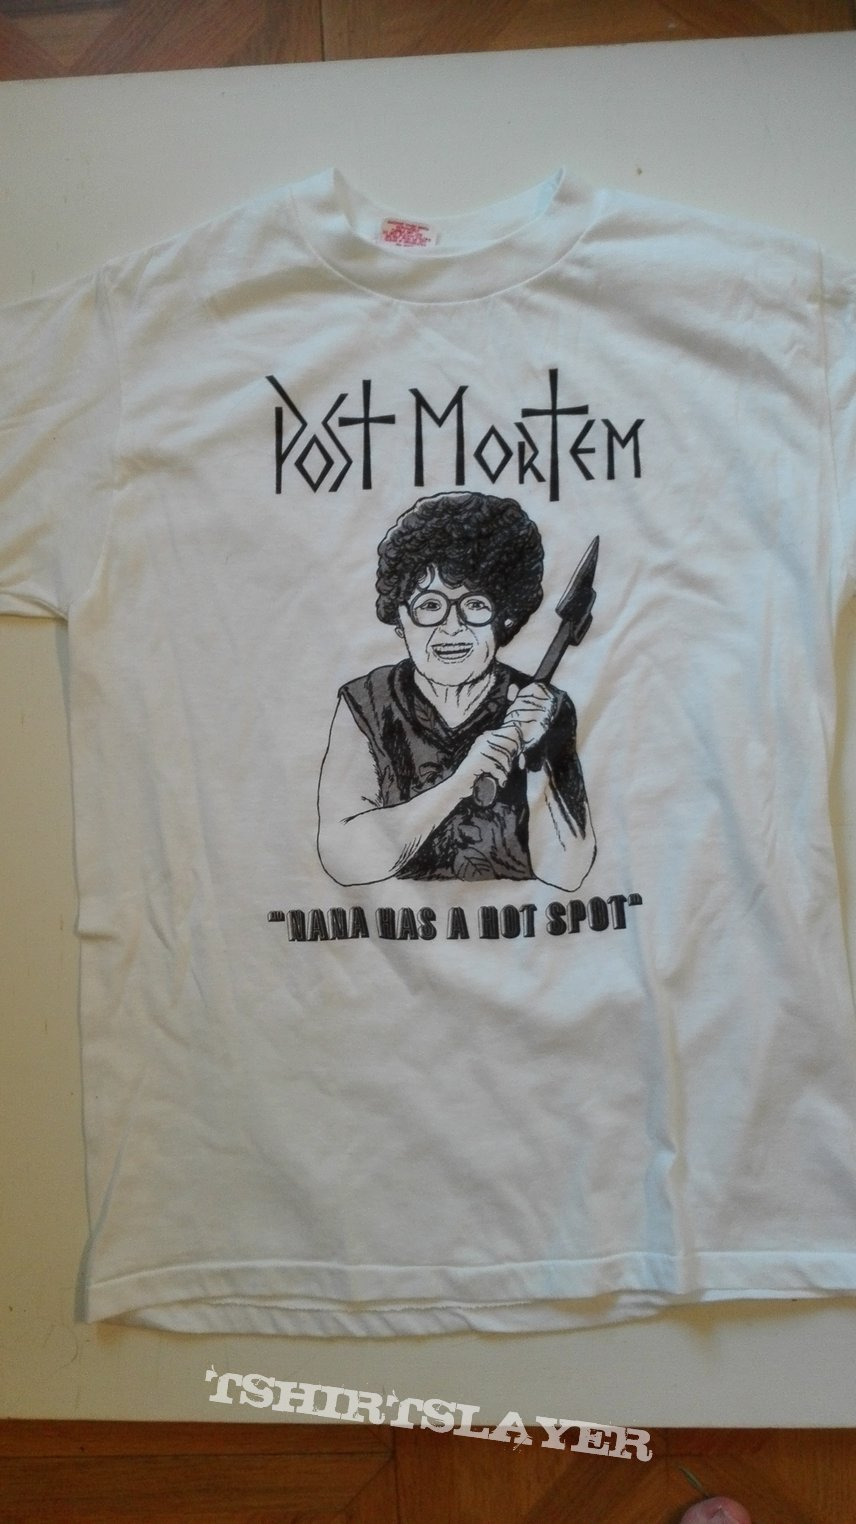 Post Mortem- Nana shirt